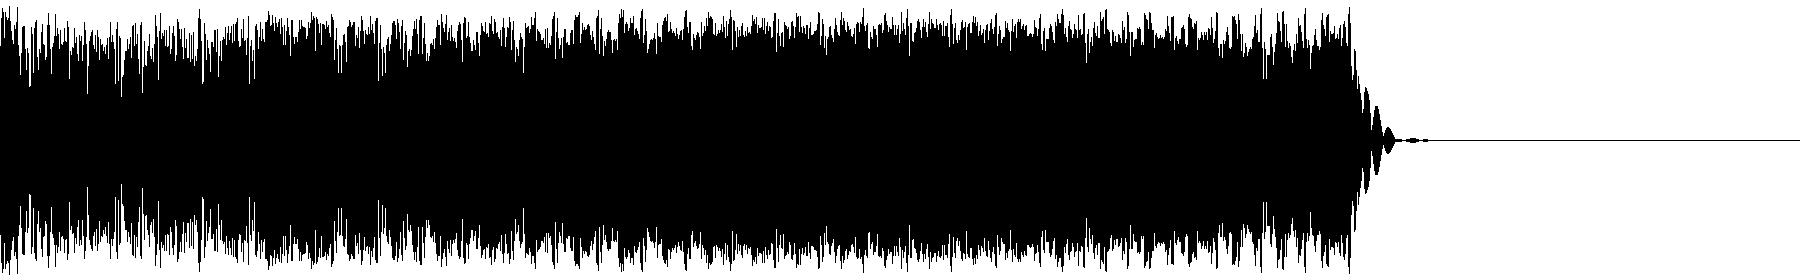 piercing distorted bass